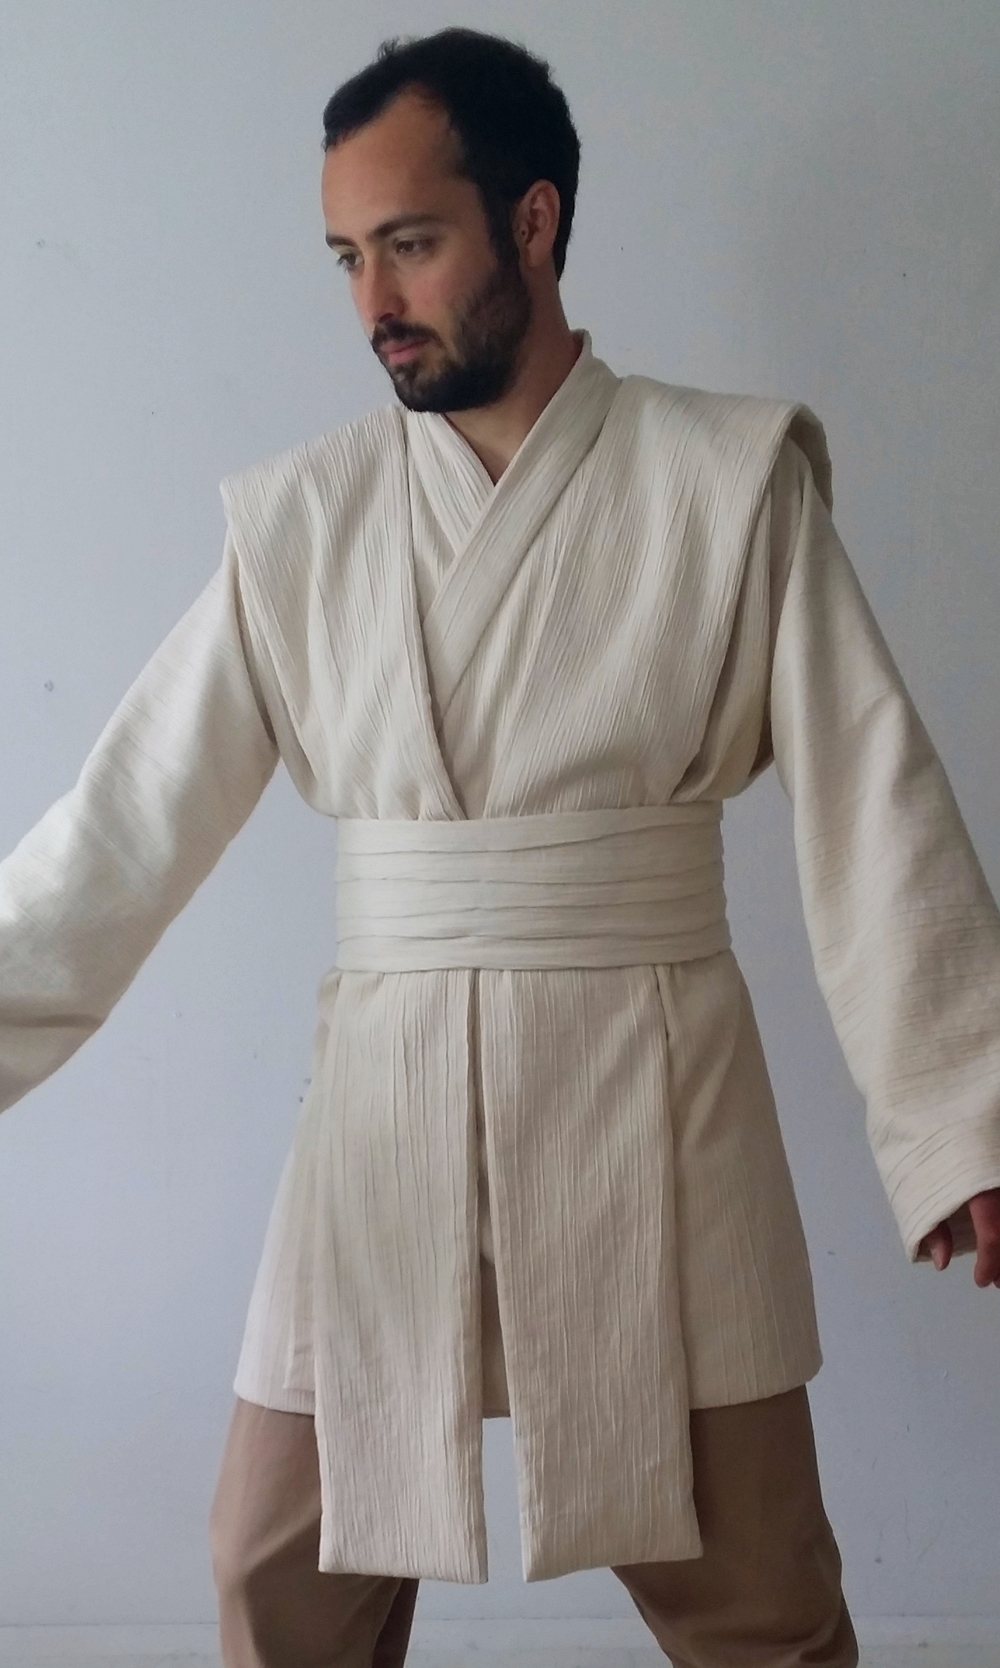 Obi Wan Kenobi Tunic